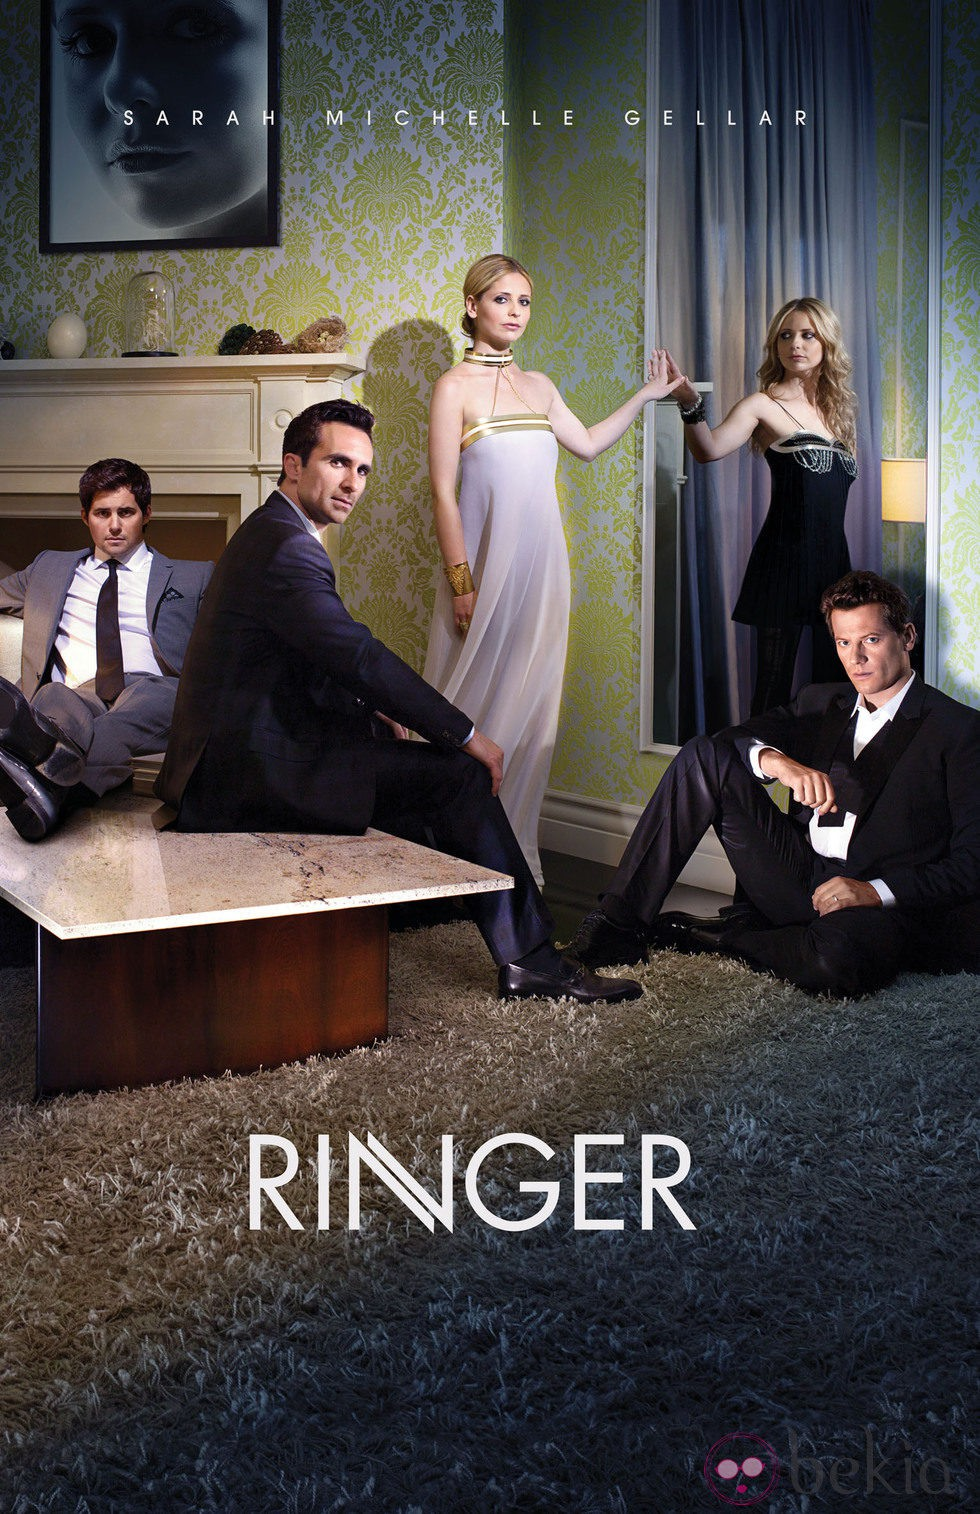 Sarah Michelle Gellar en el póster promocional de 'Ringer'